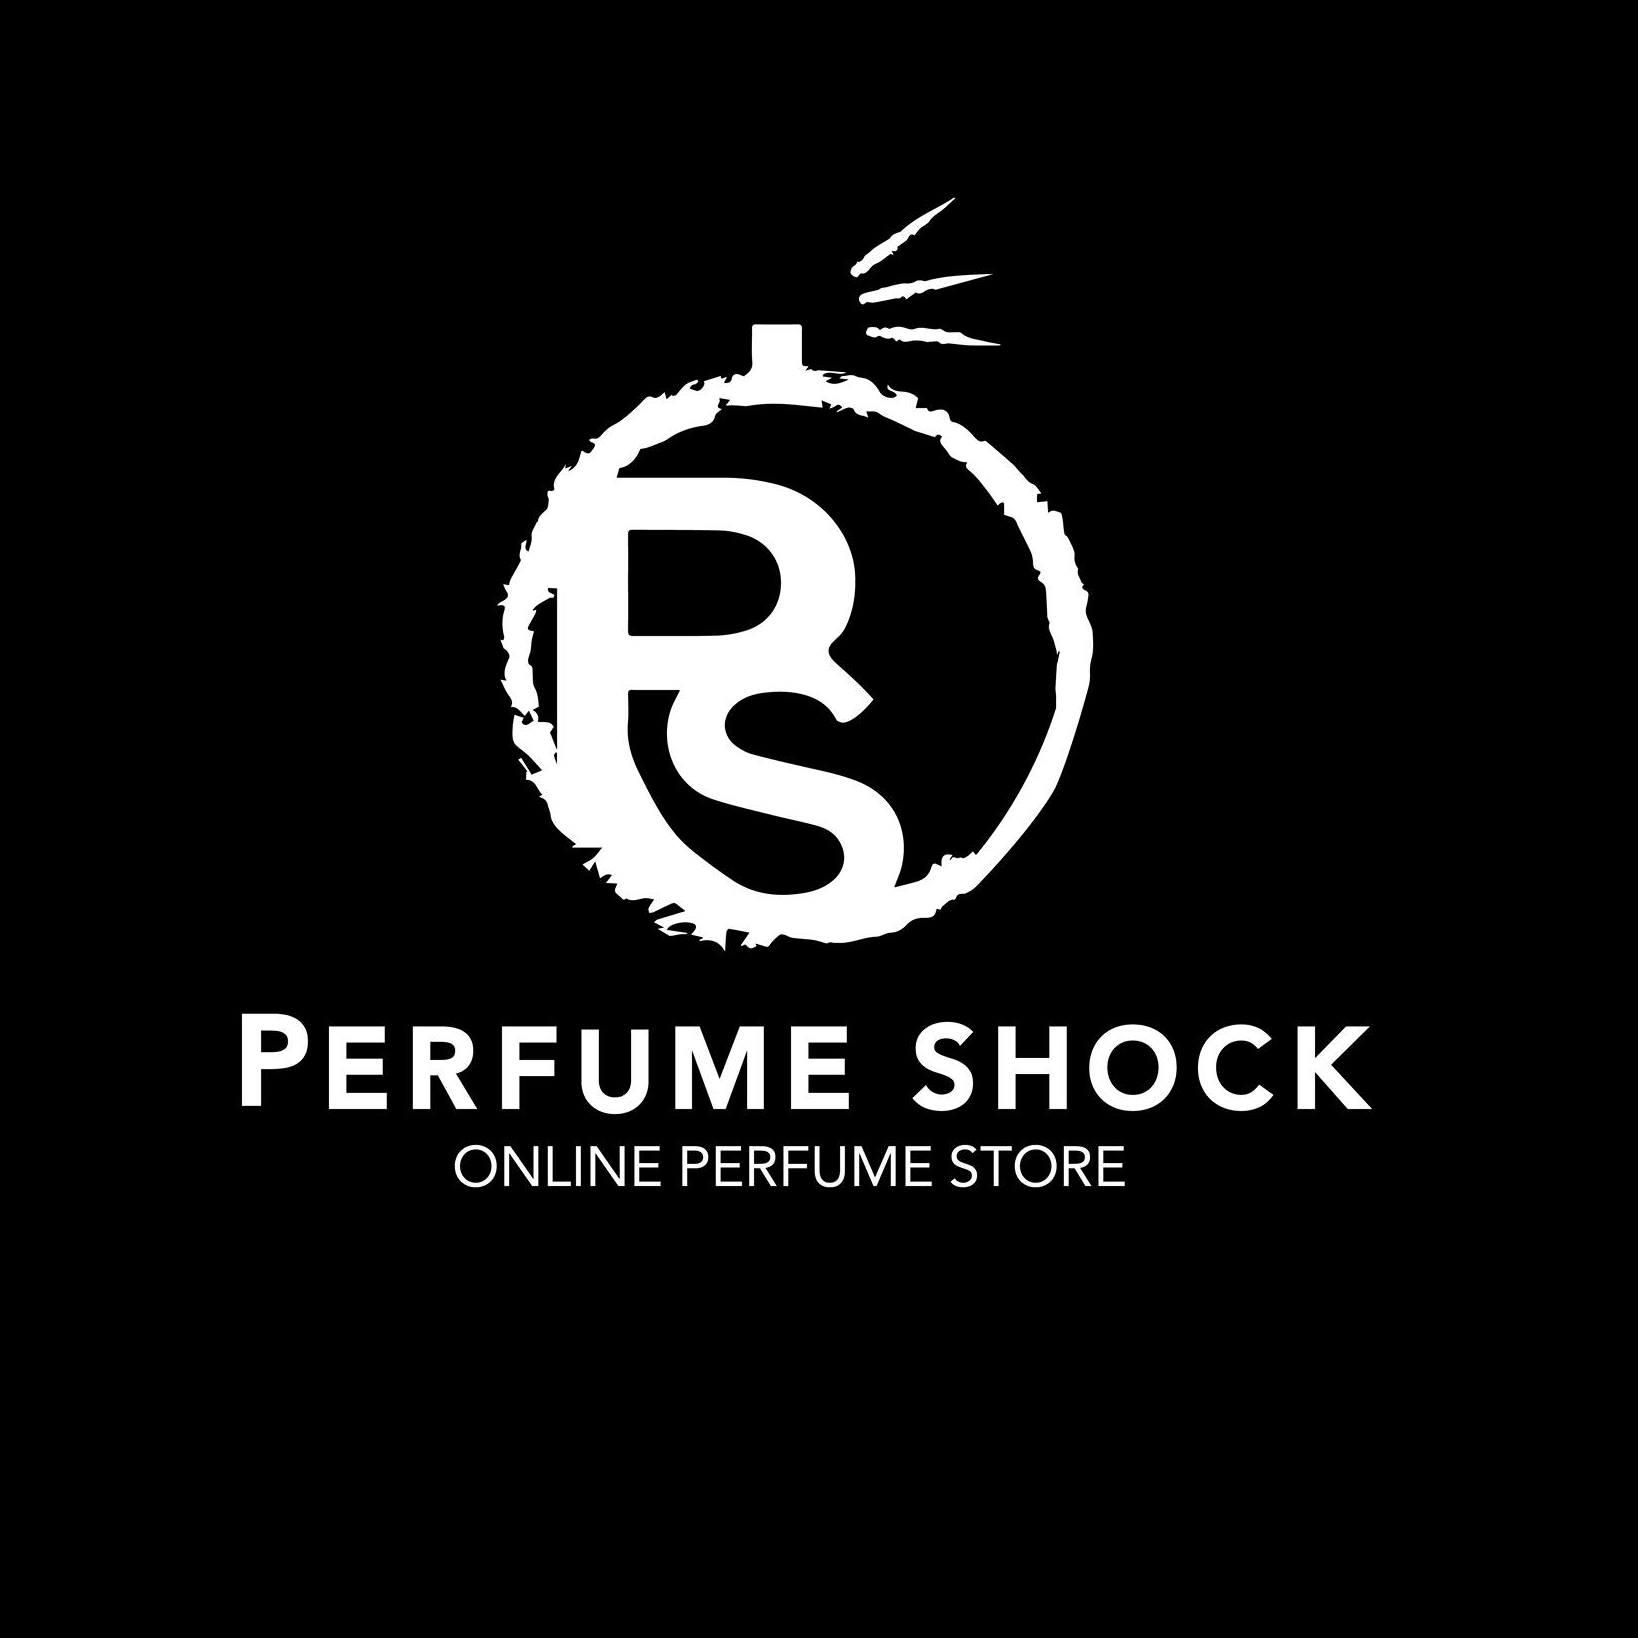 Perfume Shock